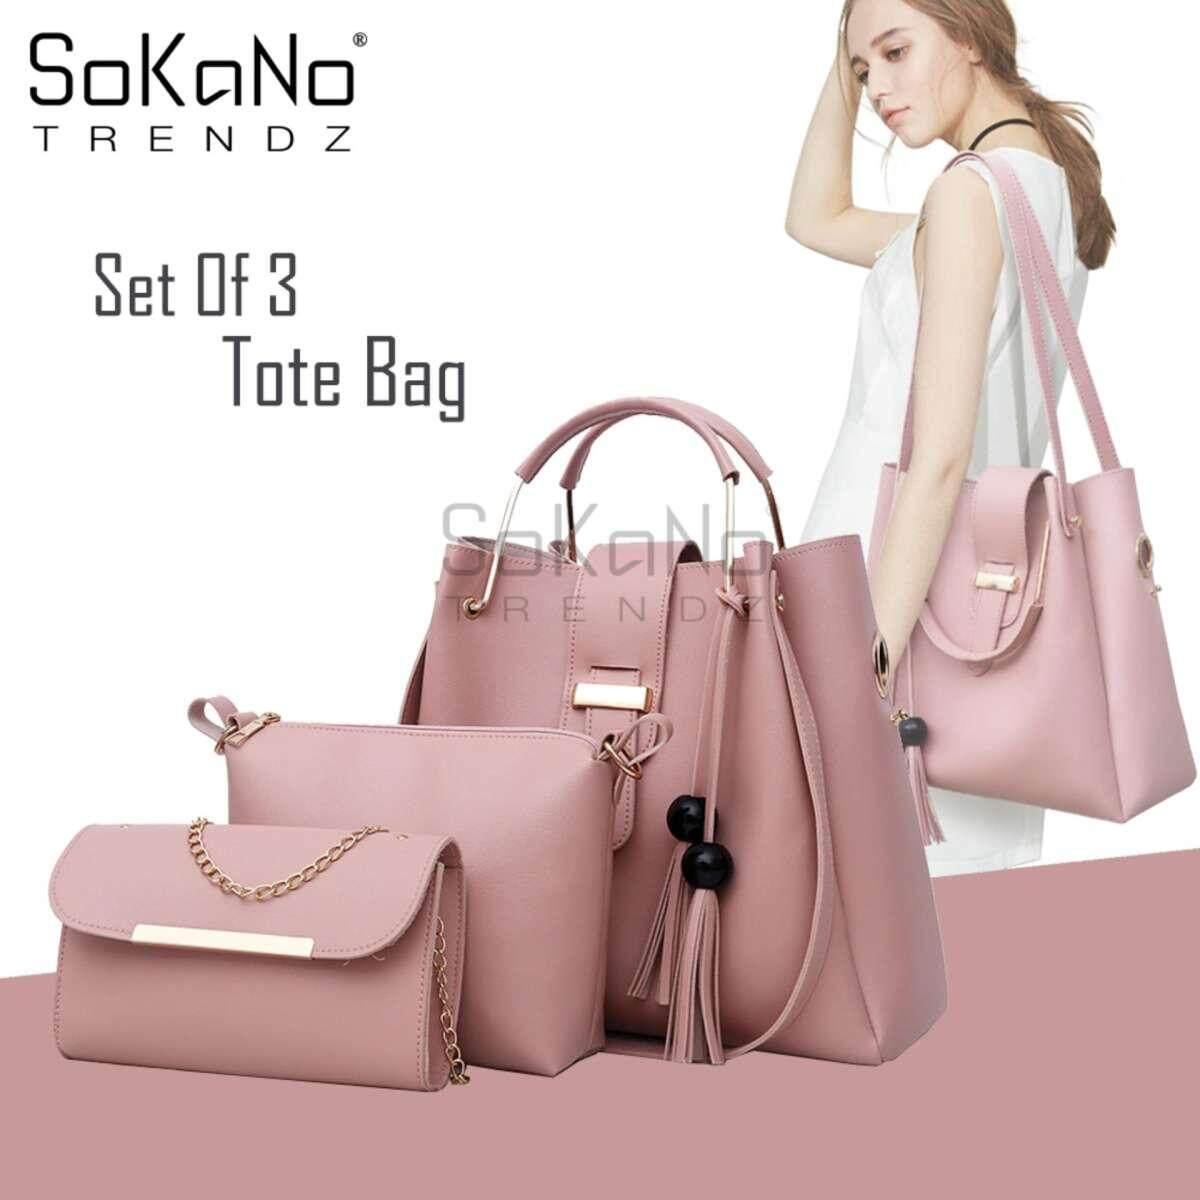 SoKaNo Trendz SKN841 Large Capacity European Designed Luxury Tote Bag (Set Of 3) Handbeg Wanita